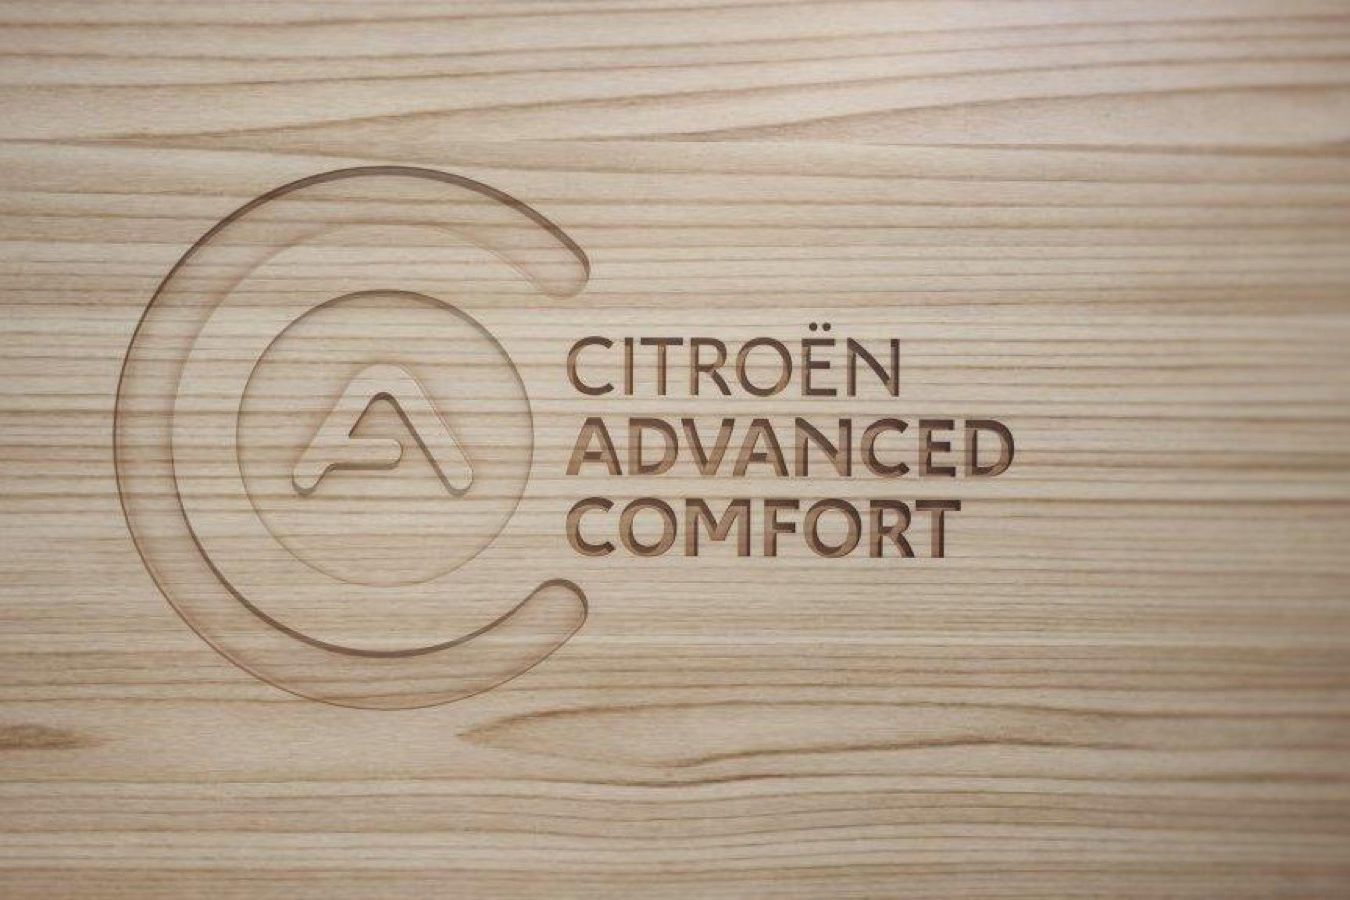 Citroën Advanced Comfort: questione di feeling